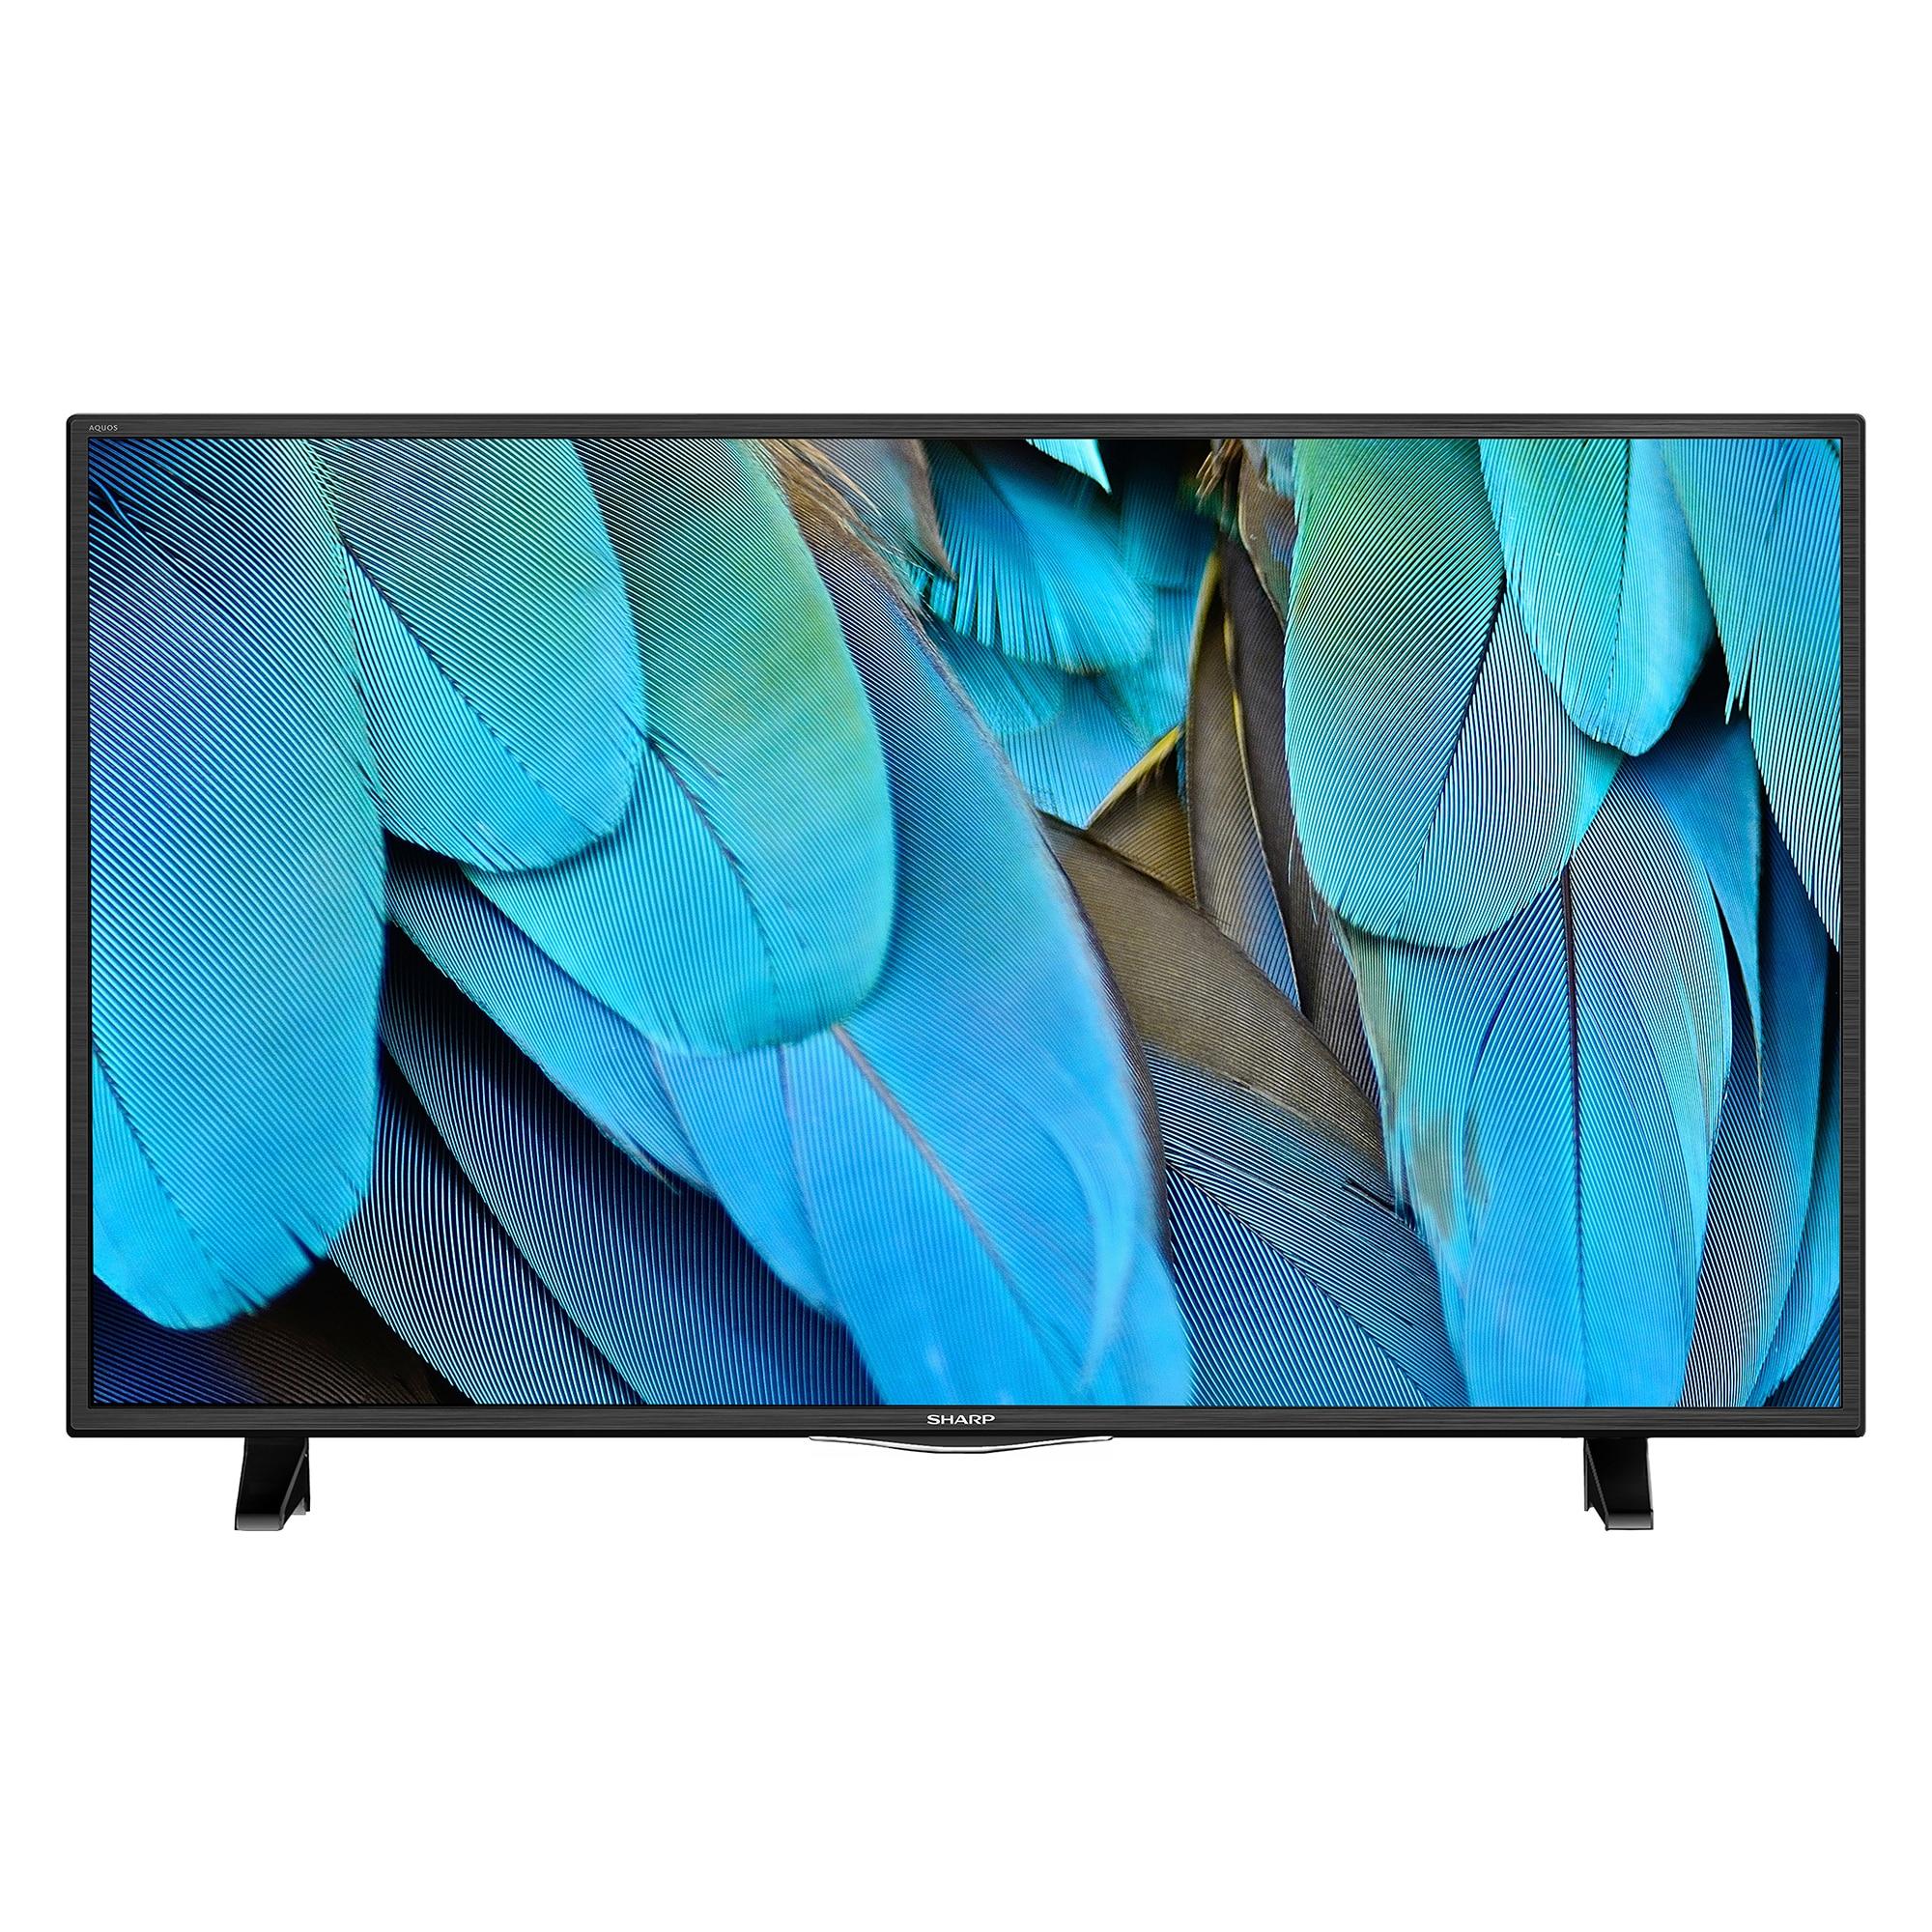 Fotografie Televizor LED Sharp, 109 cm, 43CFE4142E, Full HD